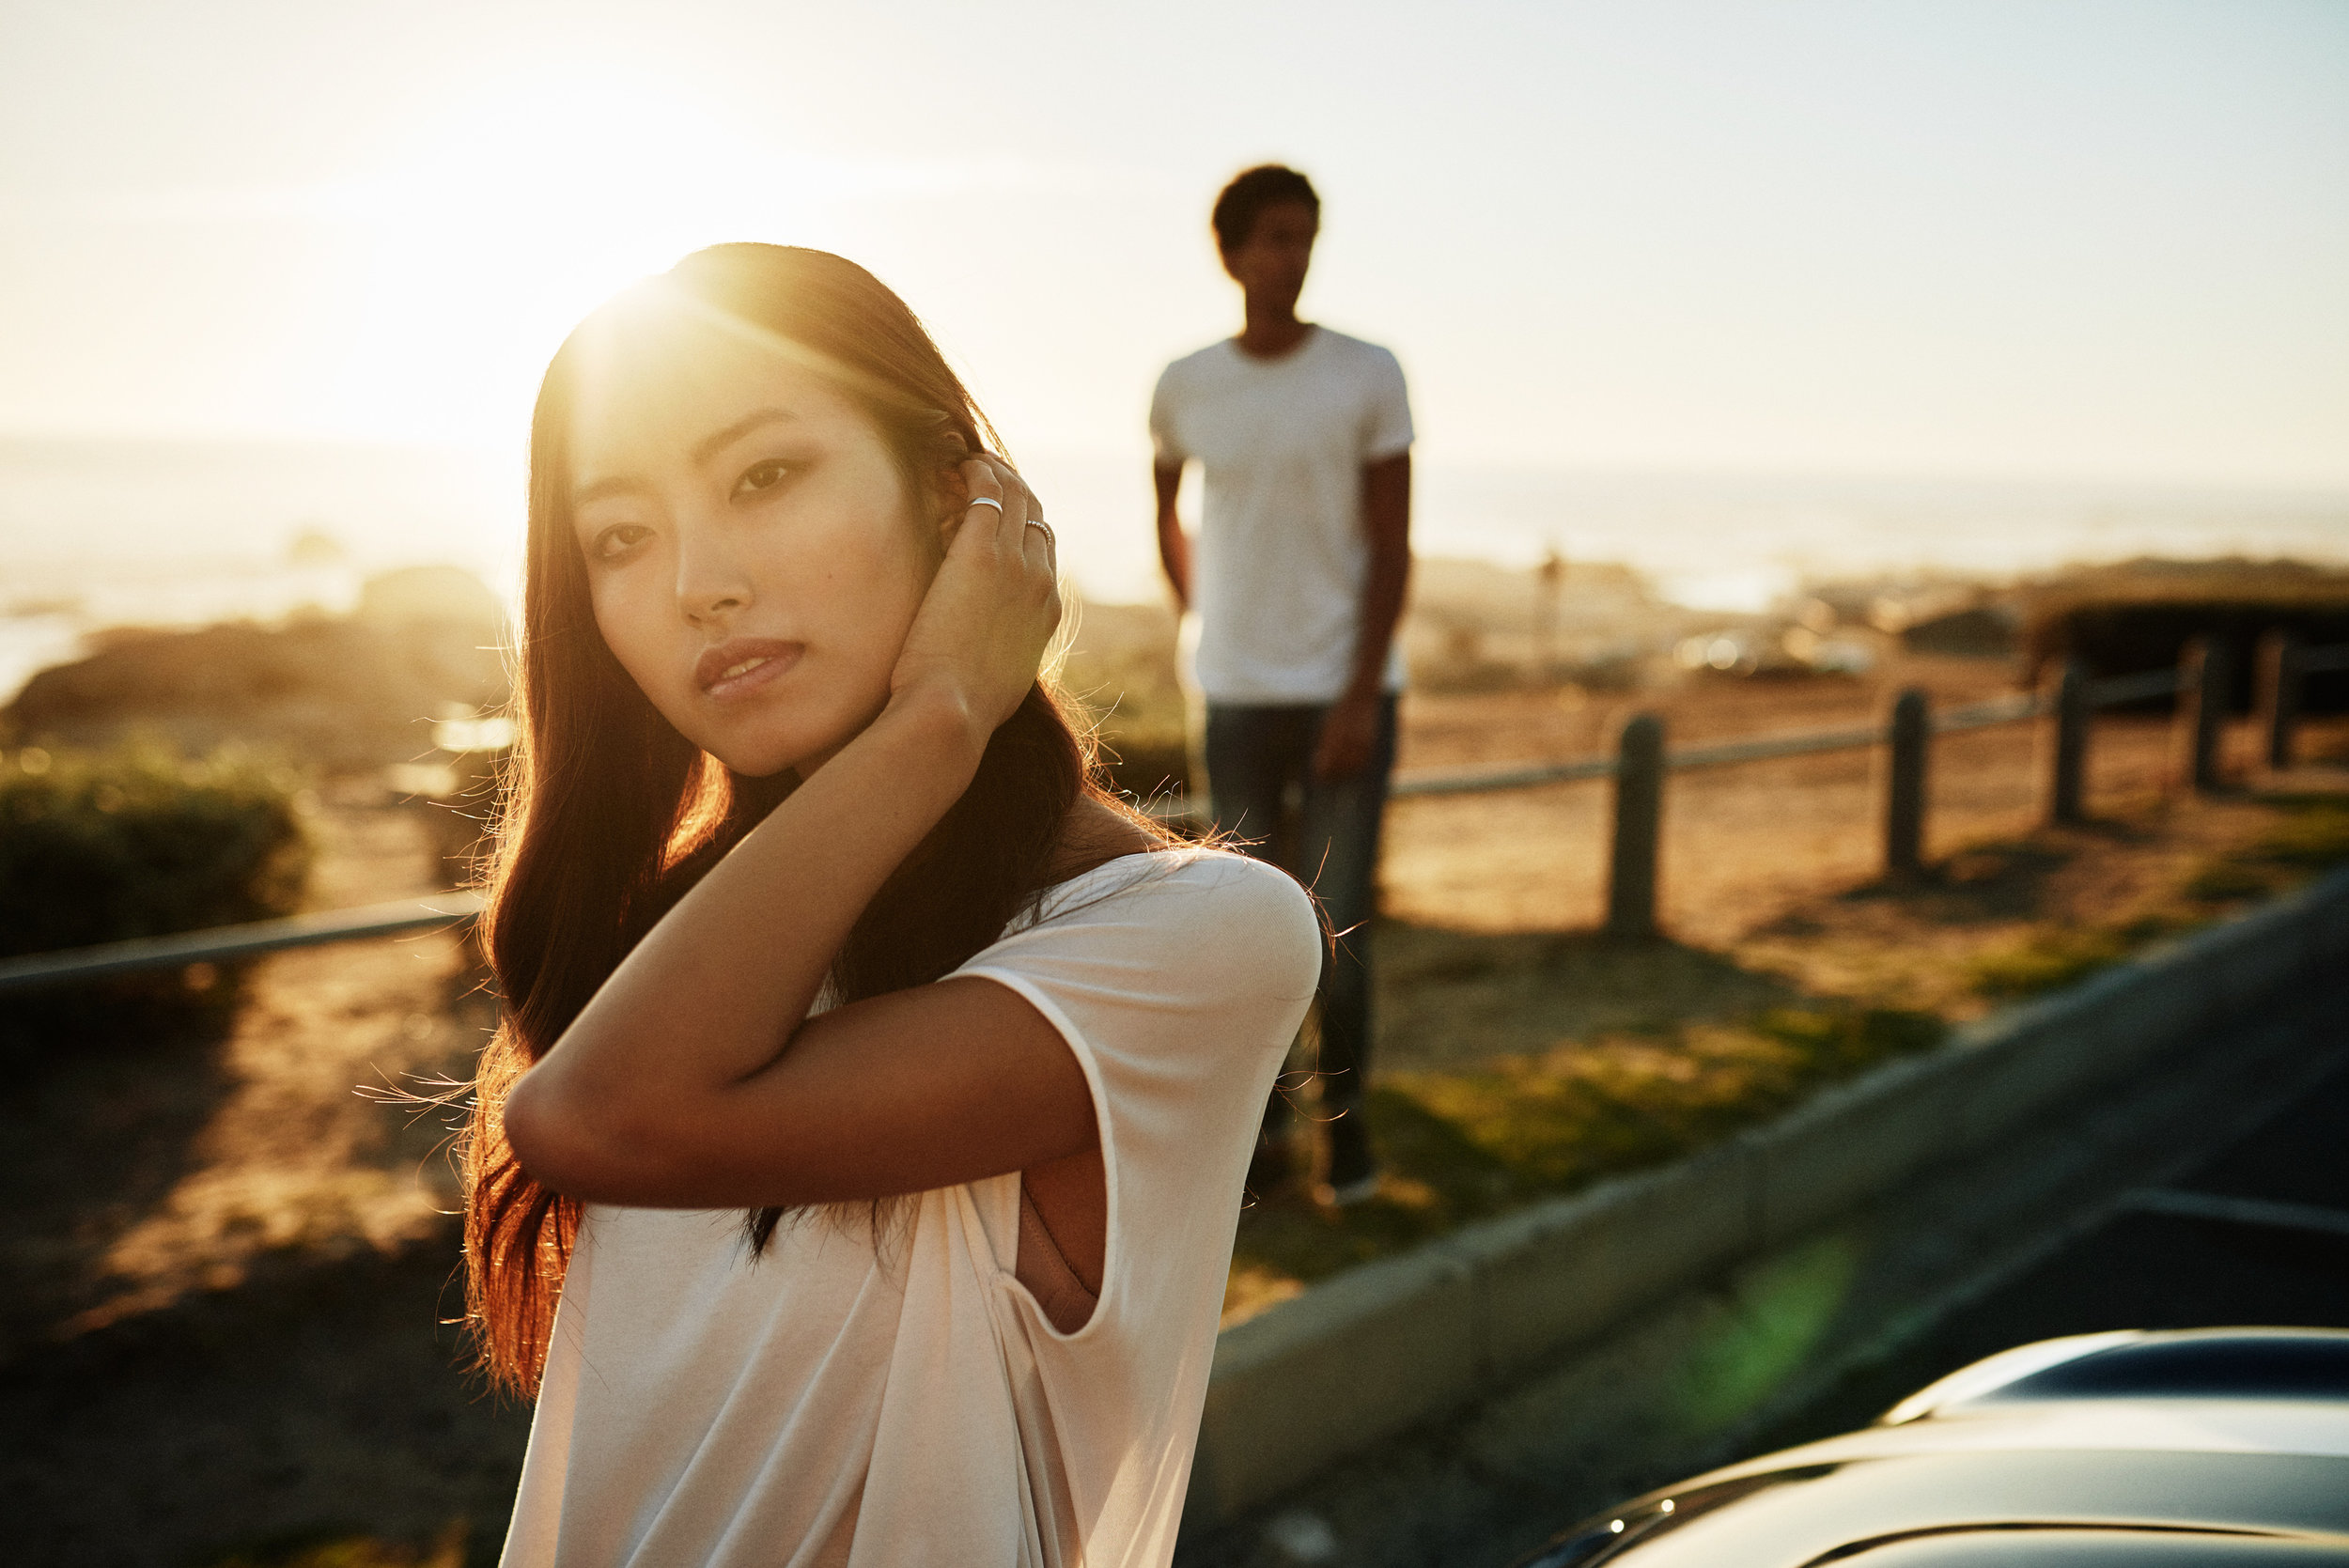 maxmotel_sw_mini-cooper-couple_capetown2018_14_parking-lot_jenny_1992.jpg